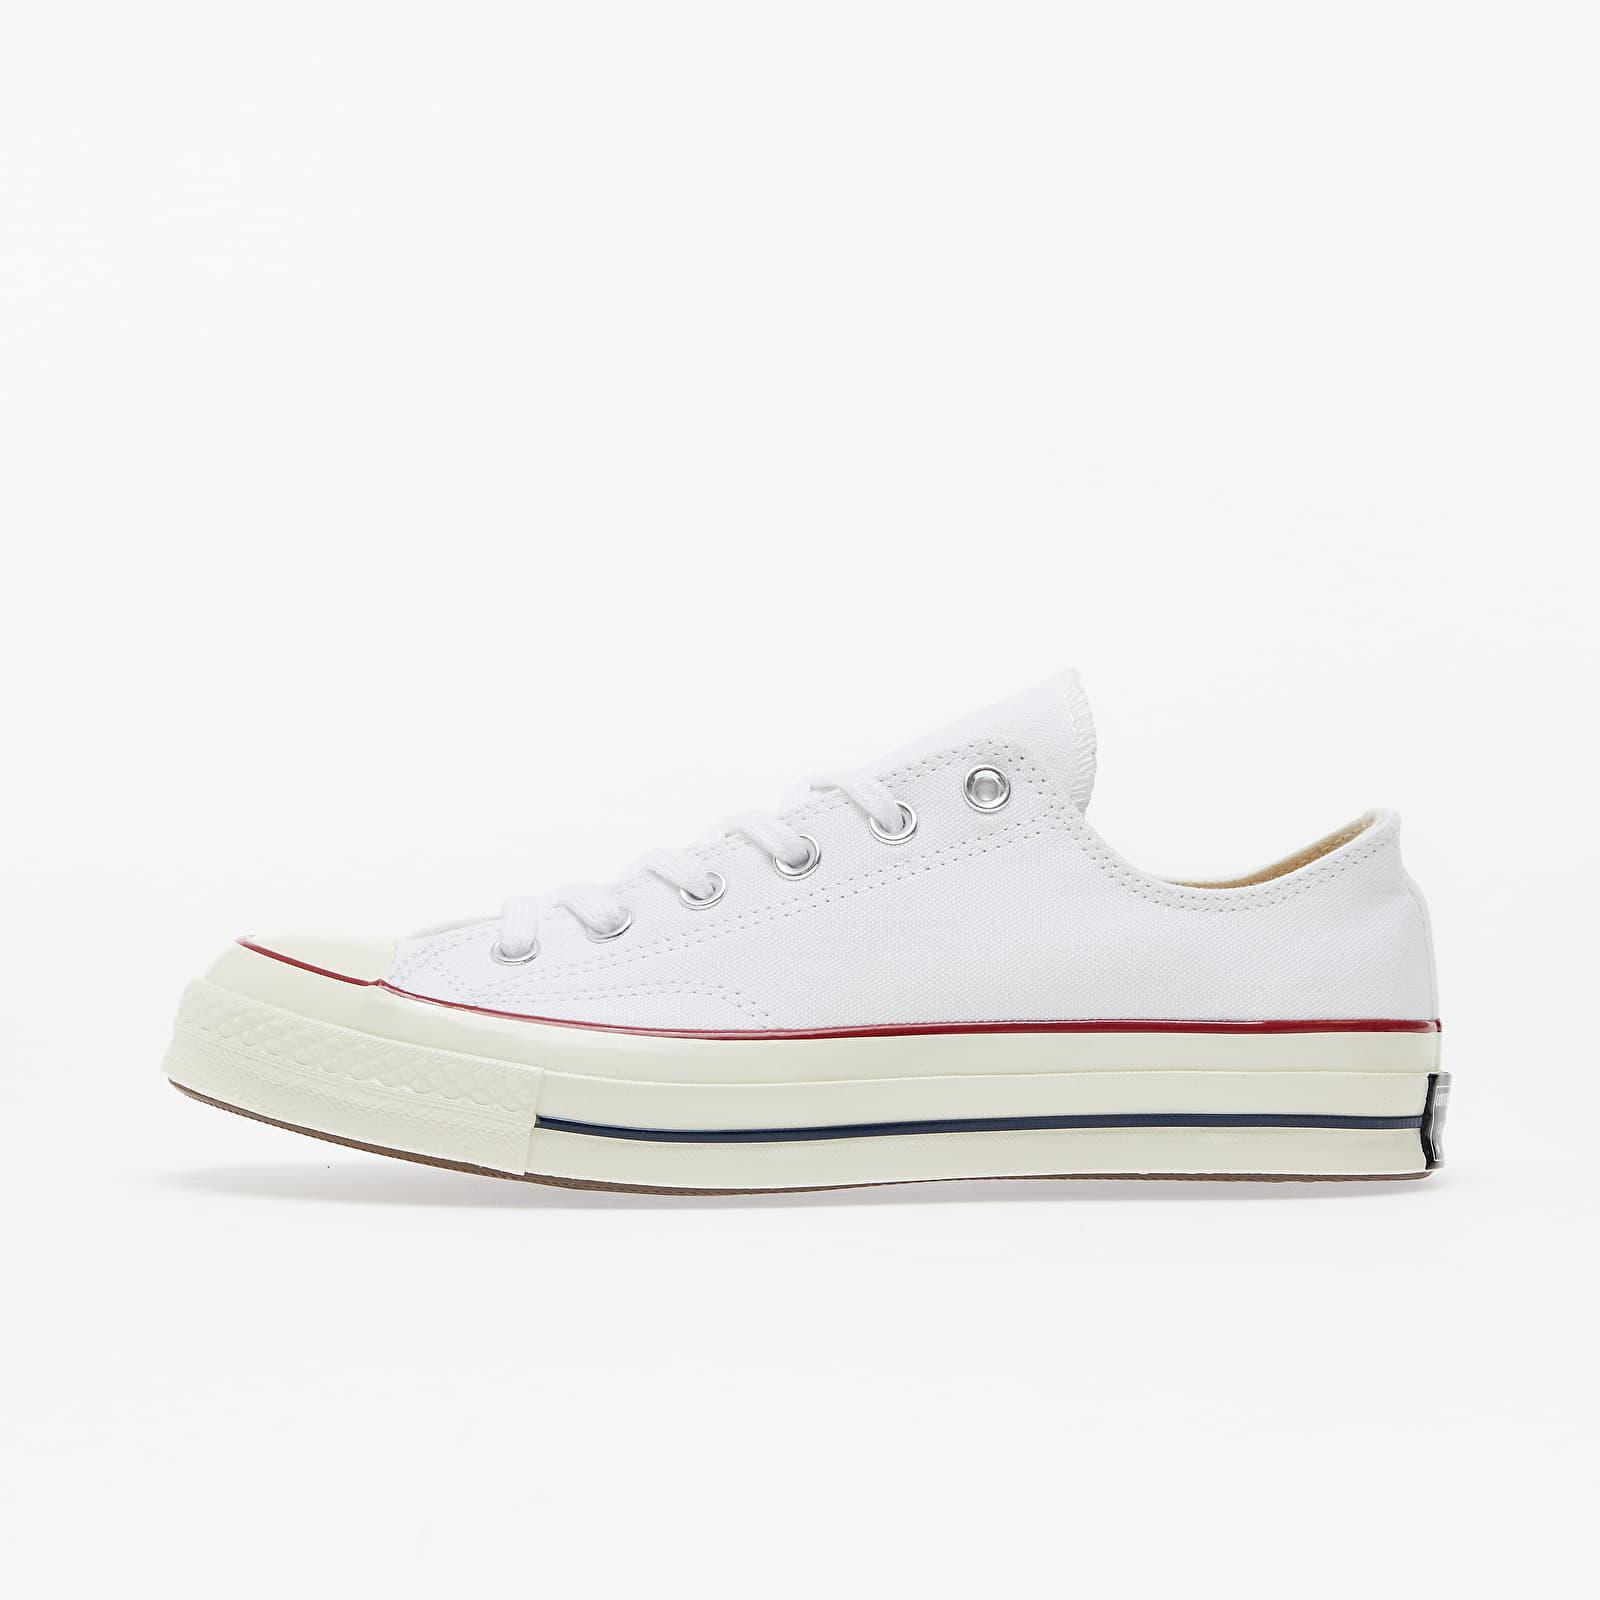 Converse Chuck Taylor All Star 70 Ox White/ Garnet/ Egret EUR 37.5